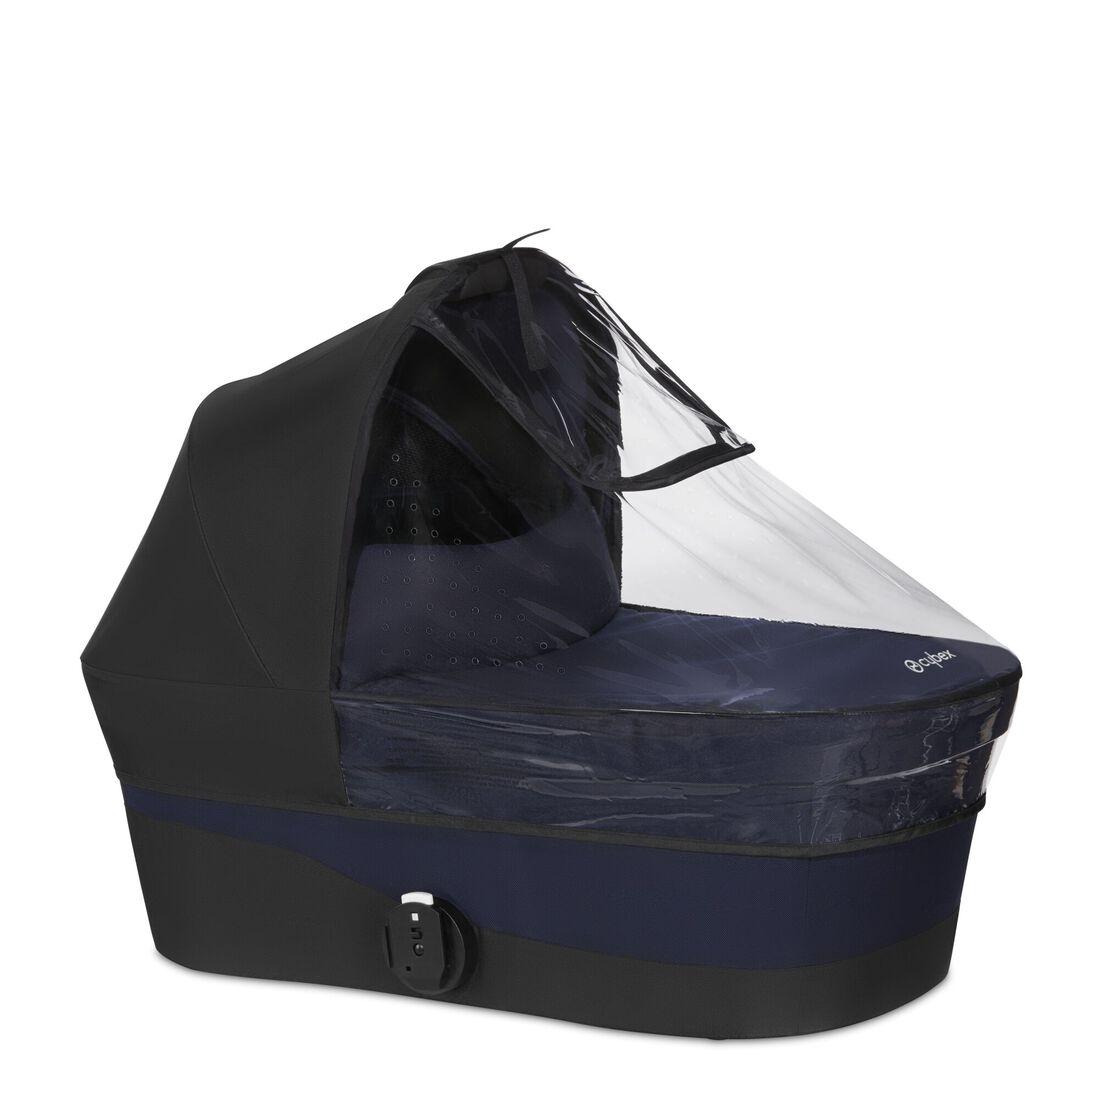 CYBEX Rain Cover Stroller Gazelle S Cot - Transparent in Transparent large image number 1